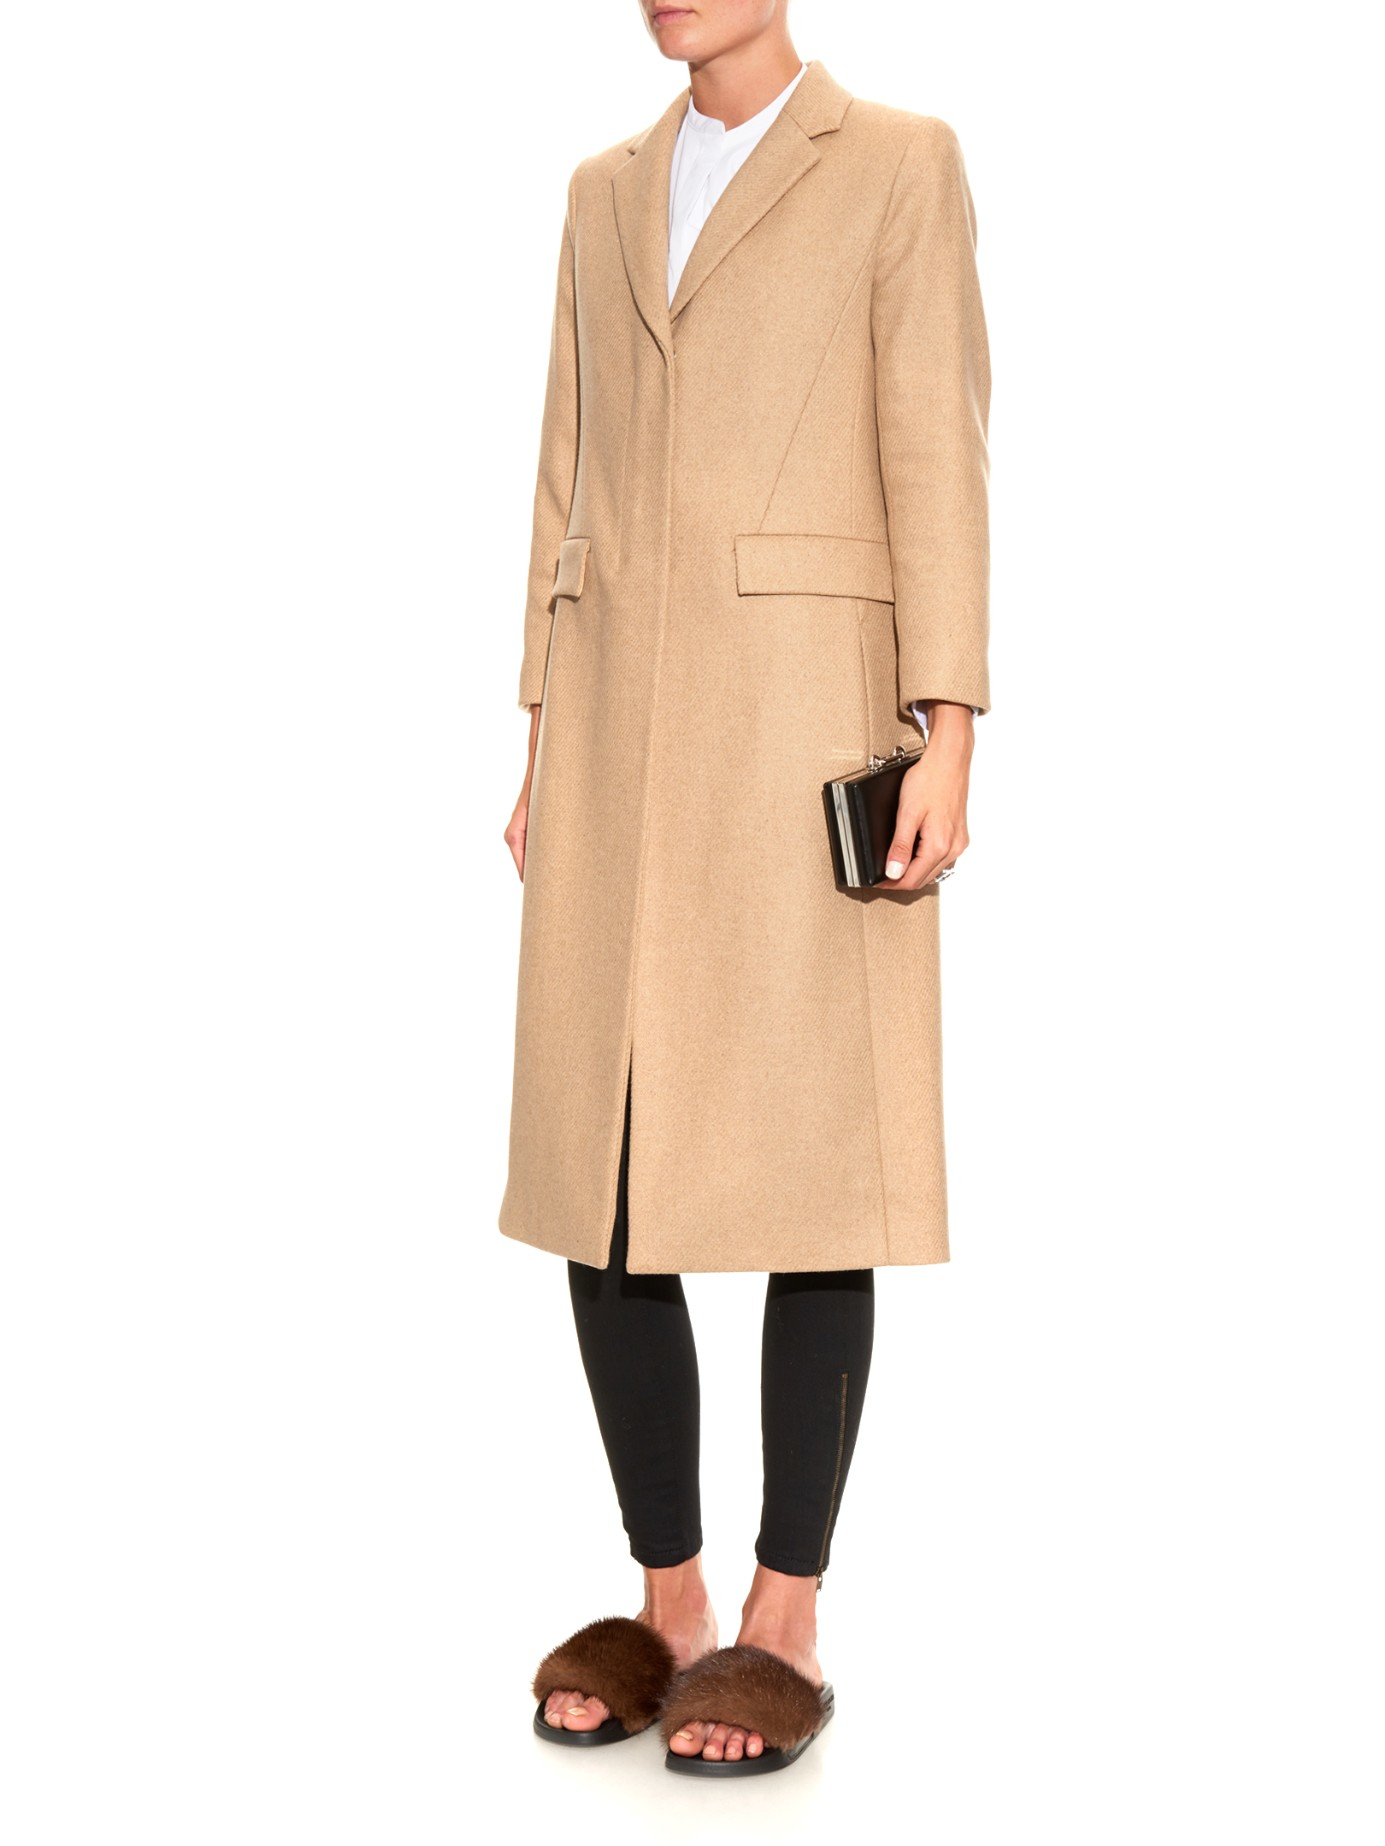 6d7fac0cb2ba Lyst - Givenchy Fur Sandals in Black